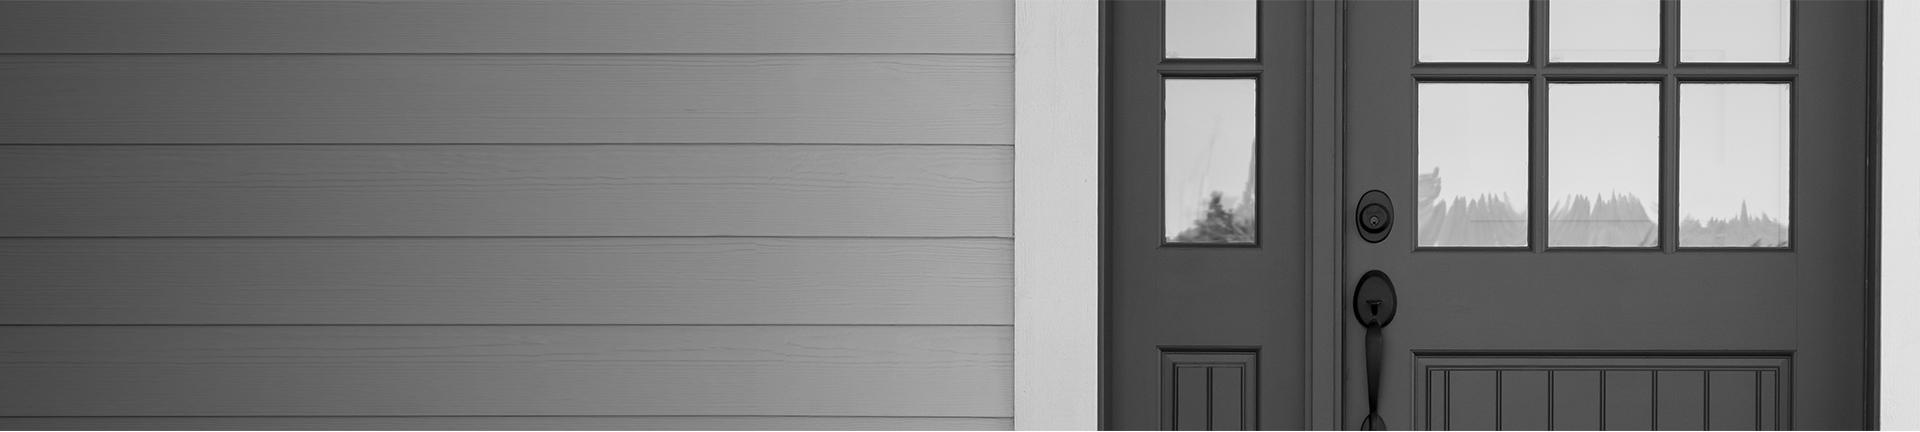 Doorstep Lab Sample Collection